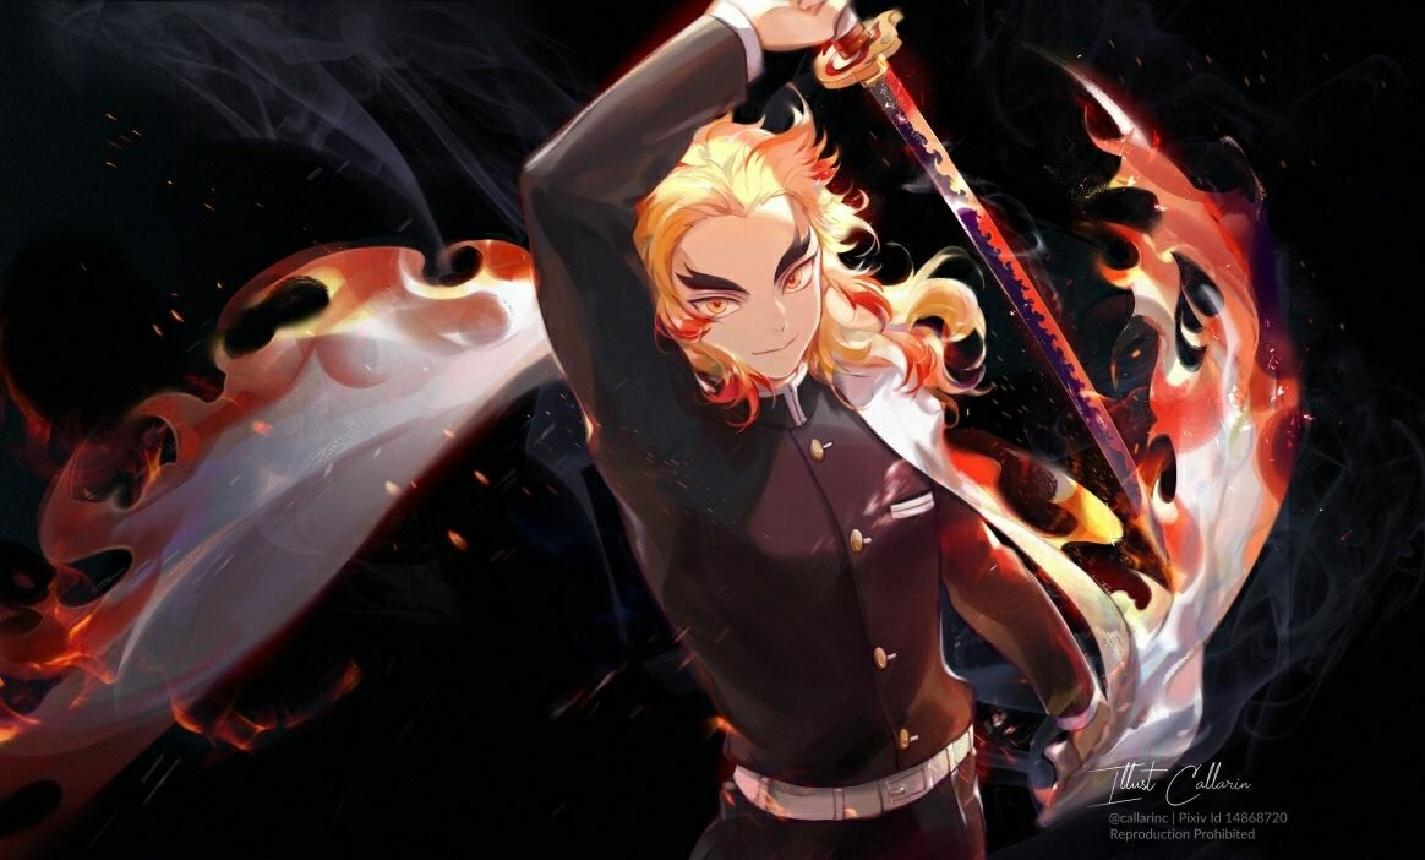 Wallpaper : Renjoku, Demon Slayer 1425x860 - qunzhong ...